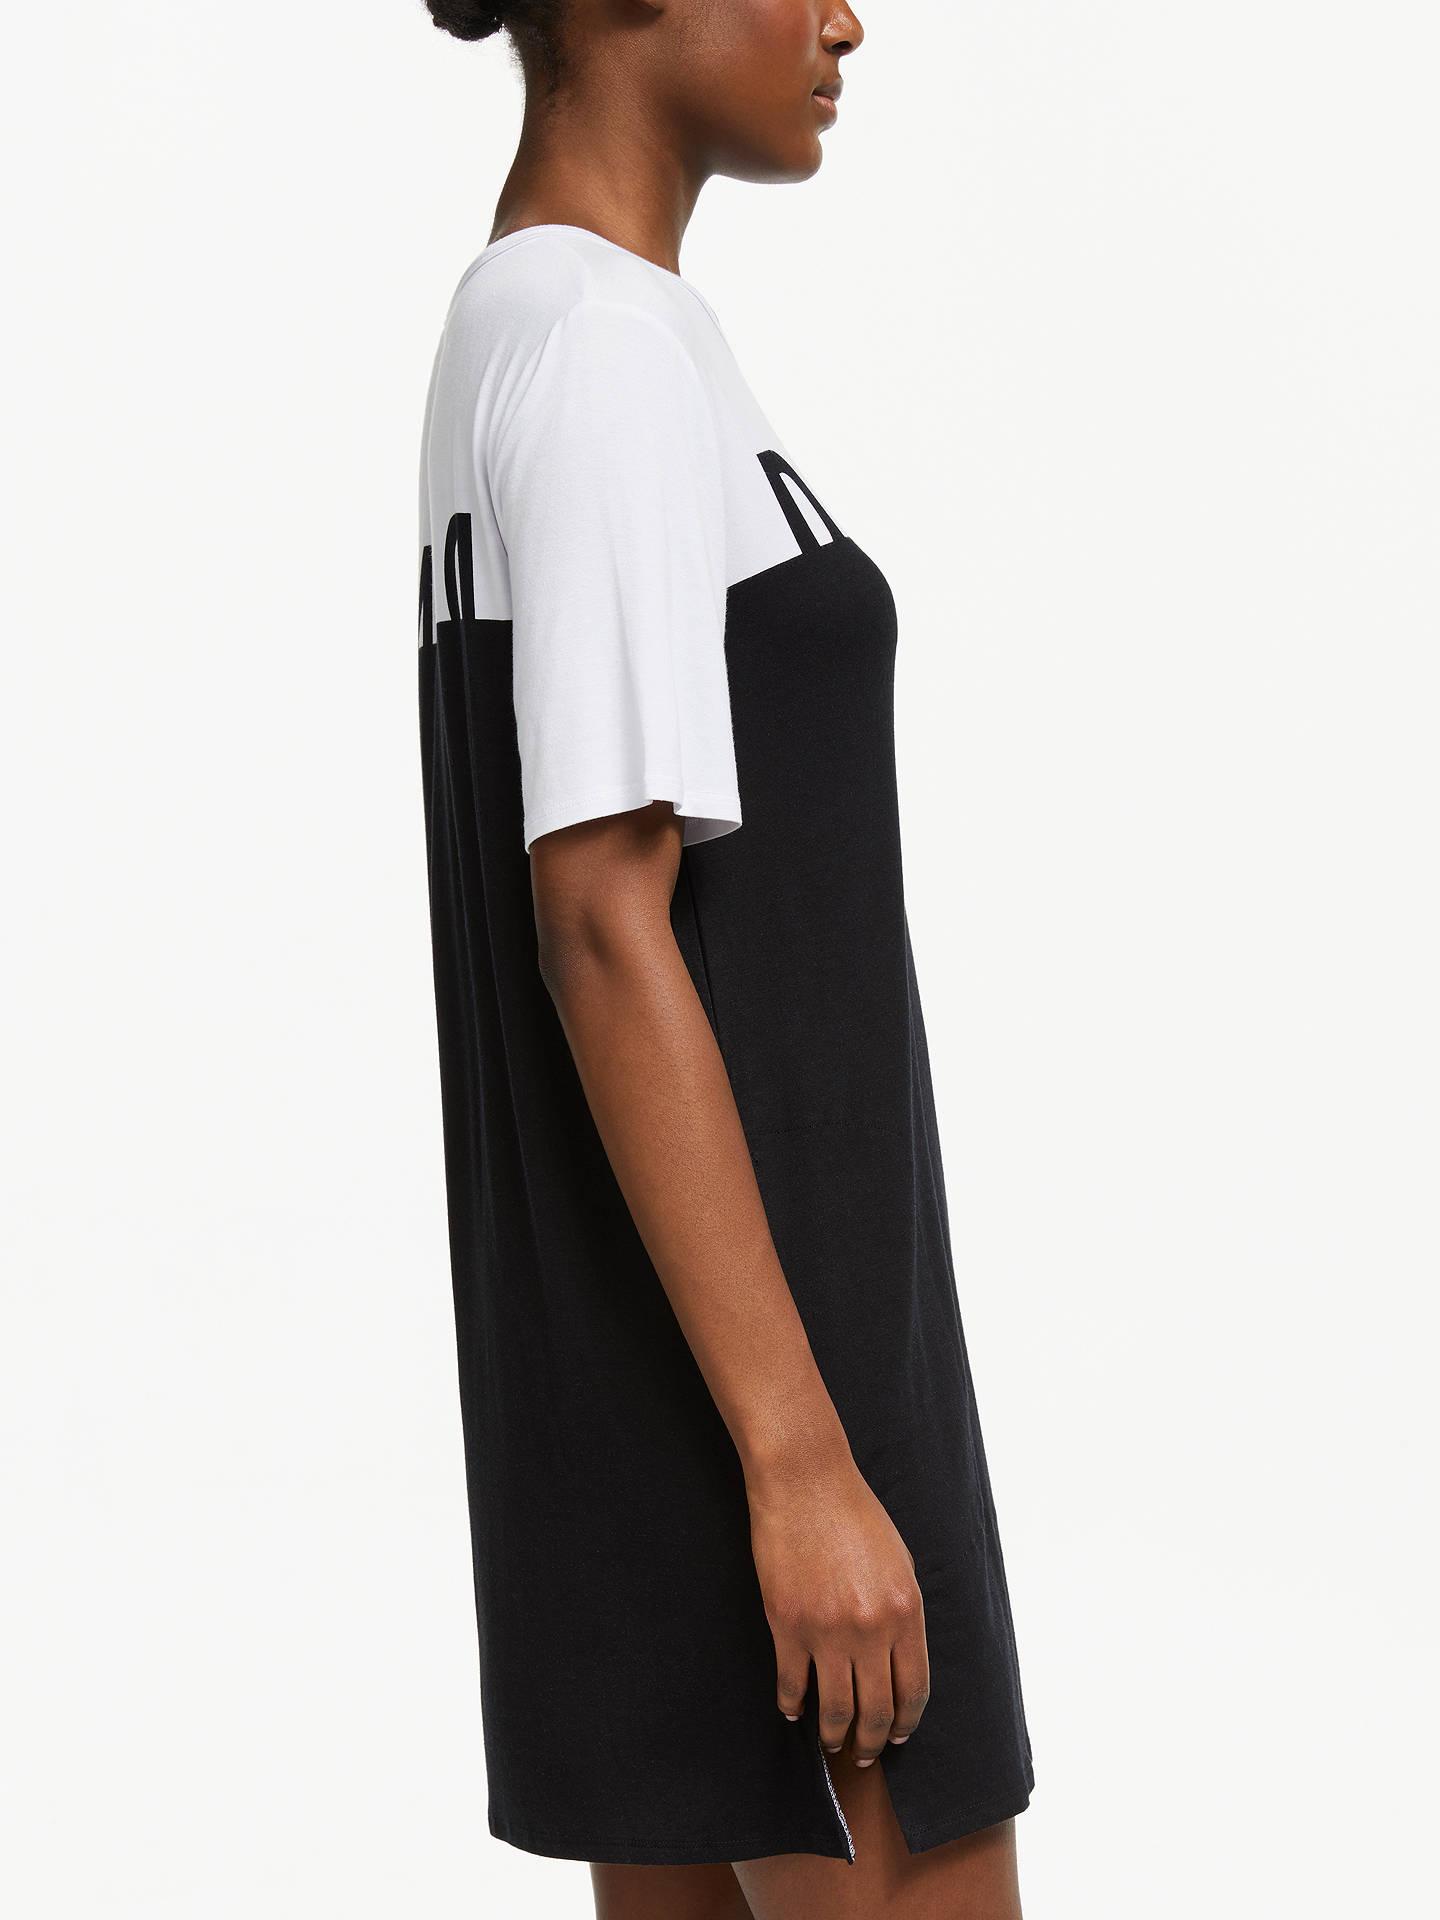 ... BuyDKNY Earn Your Stripes Nightdress 510e6b5ec